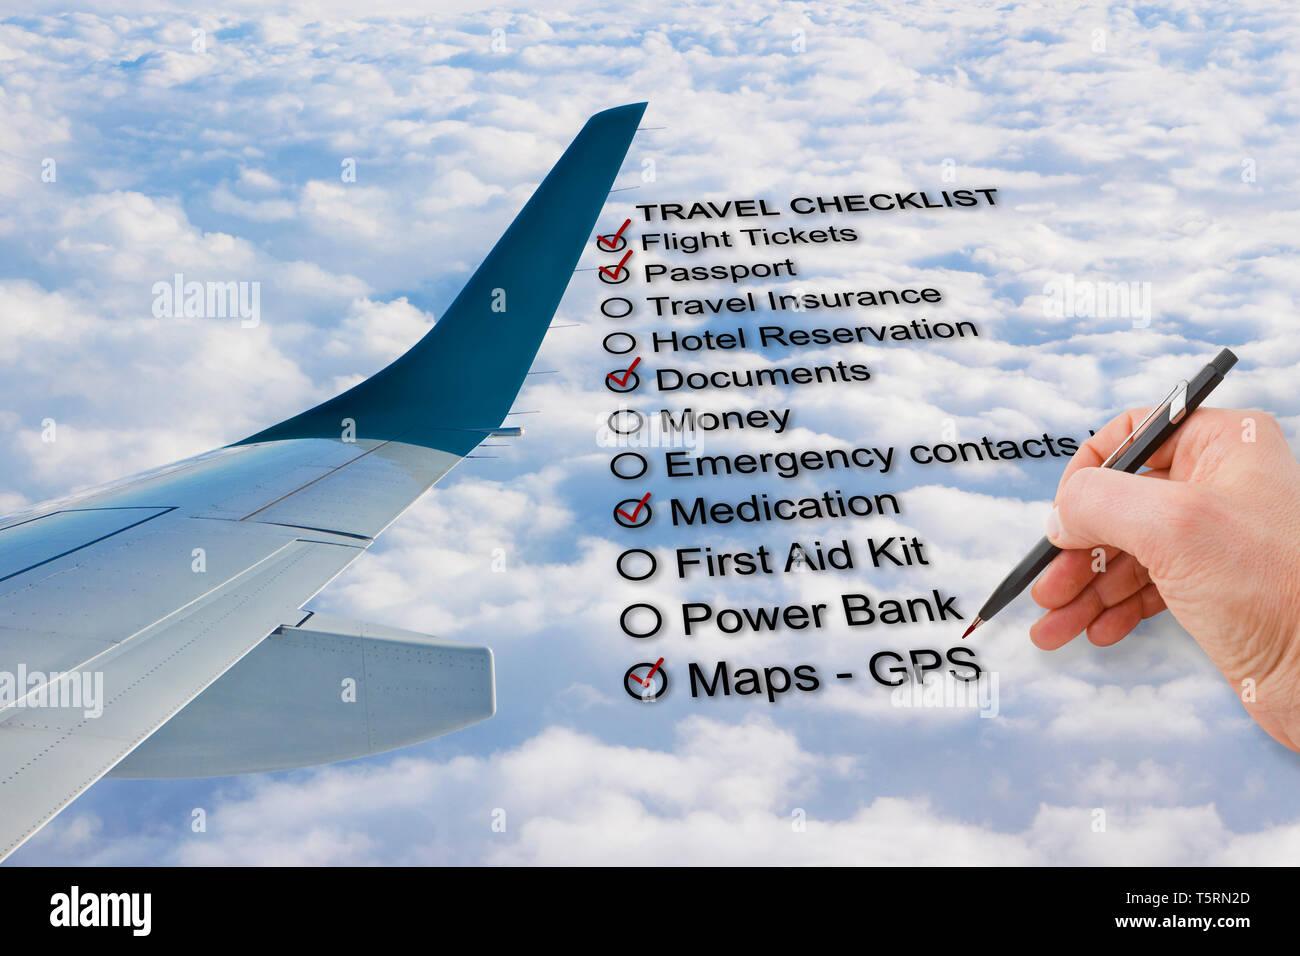 Checklist Airplane Stock Photos & Checklist Airplane Stock Images